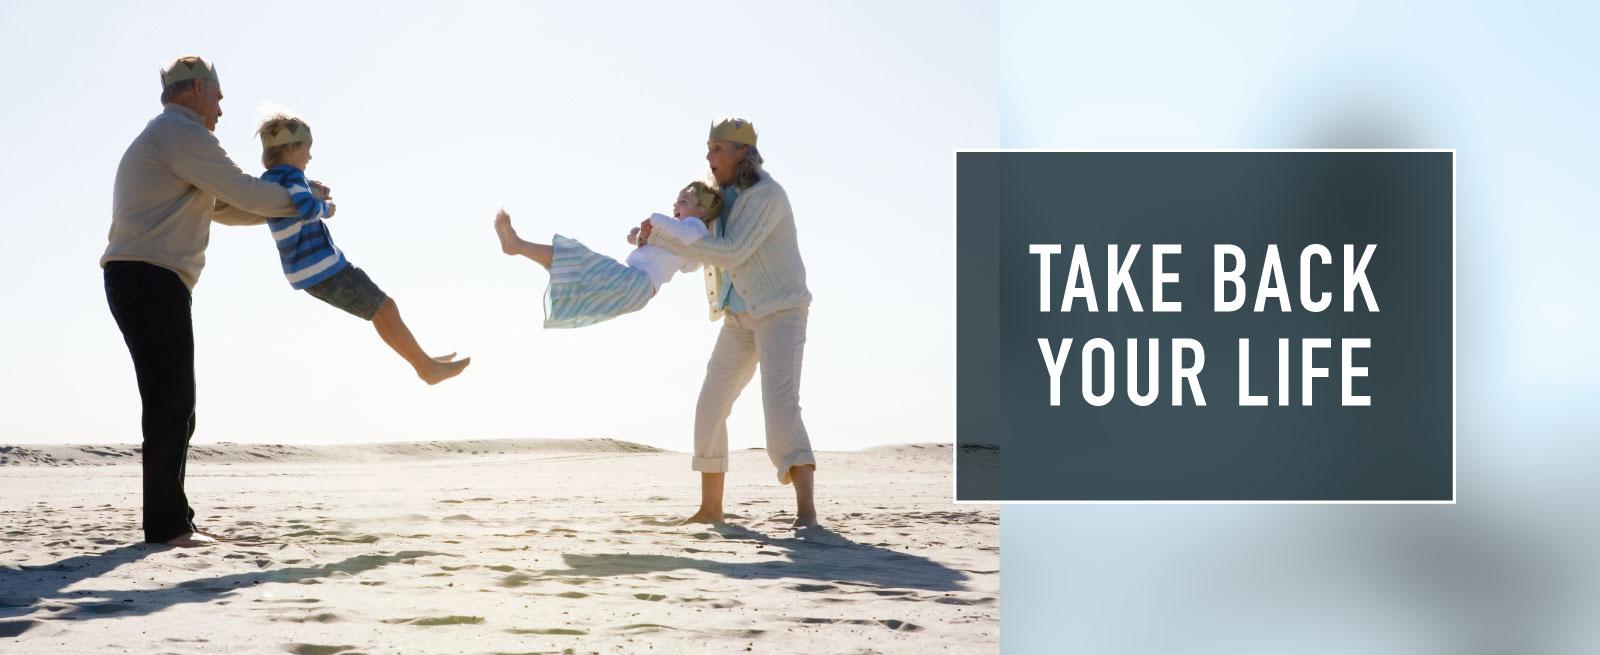 Take-BAck-your-life-3.jpg